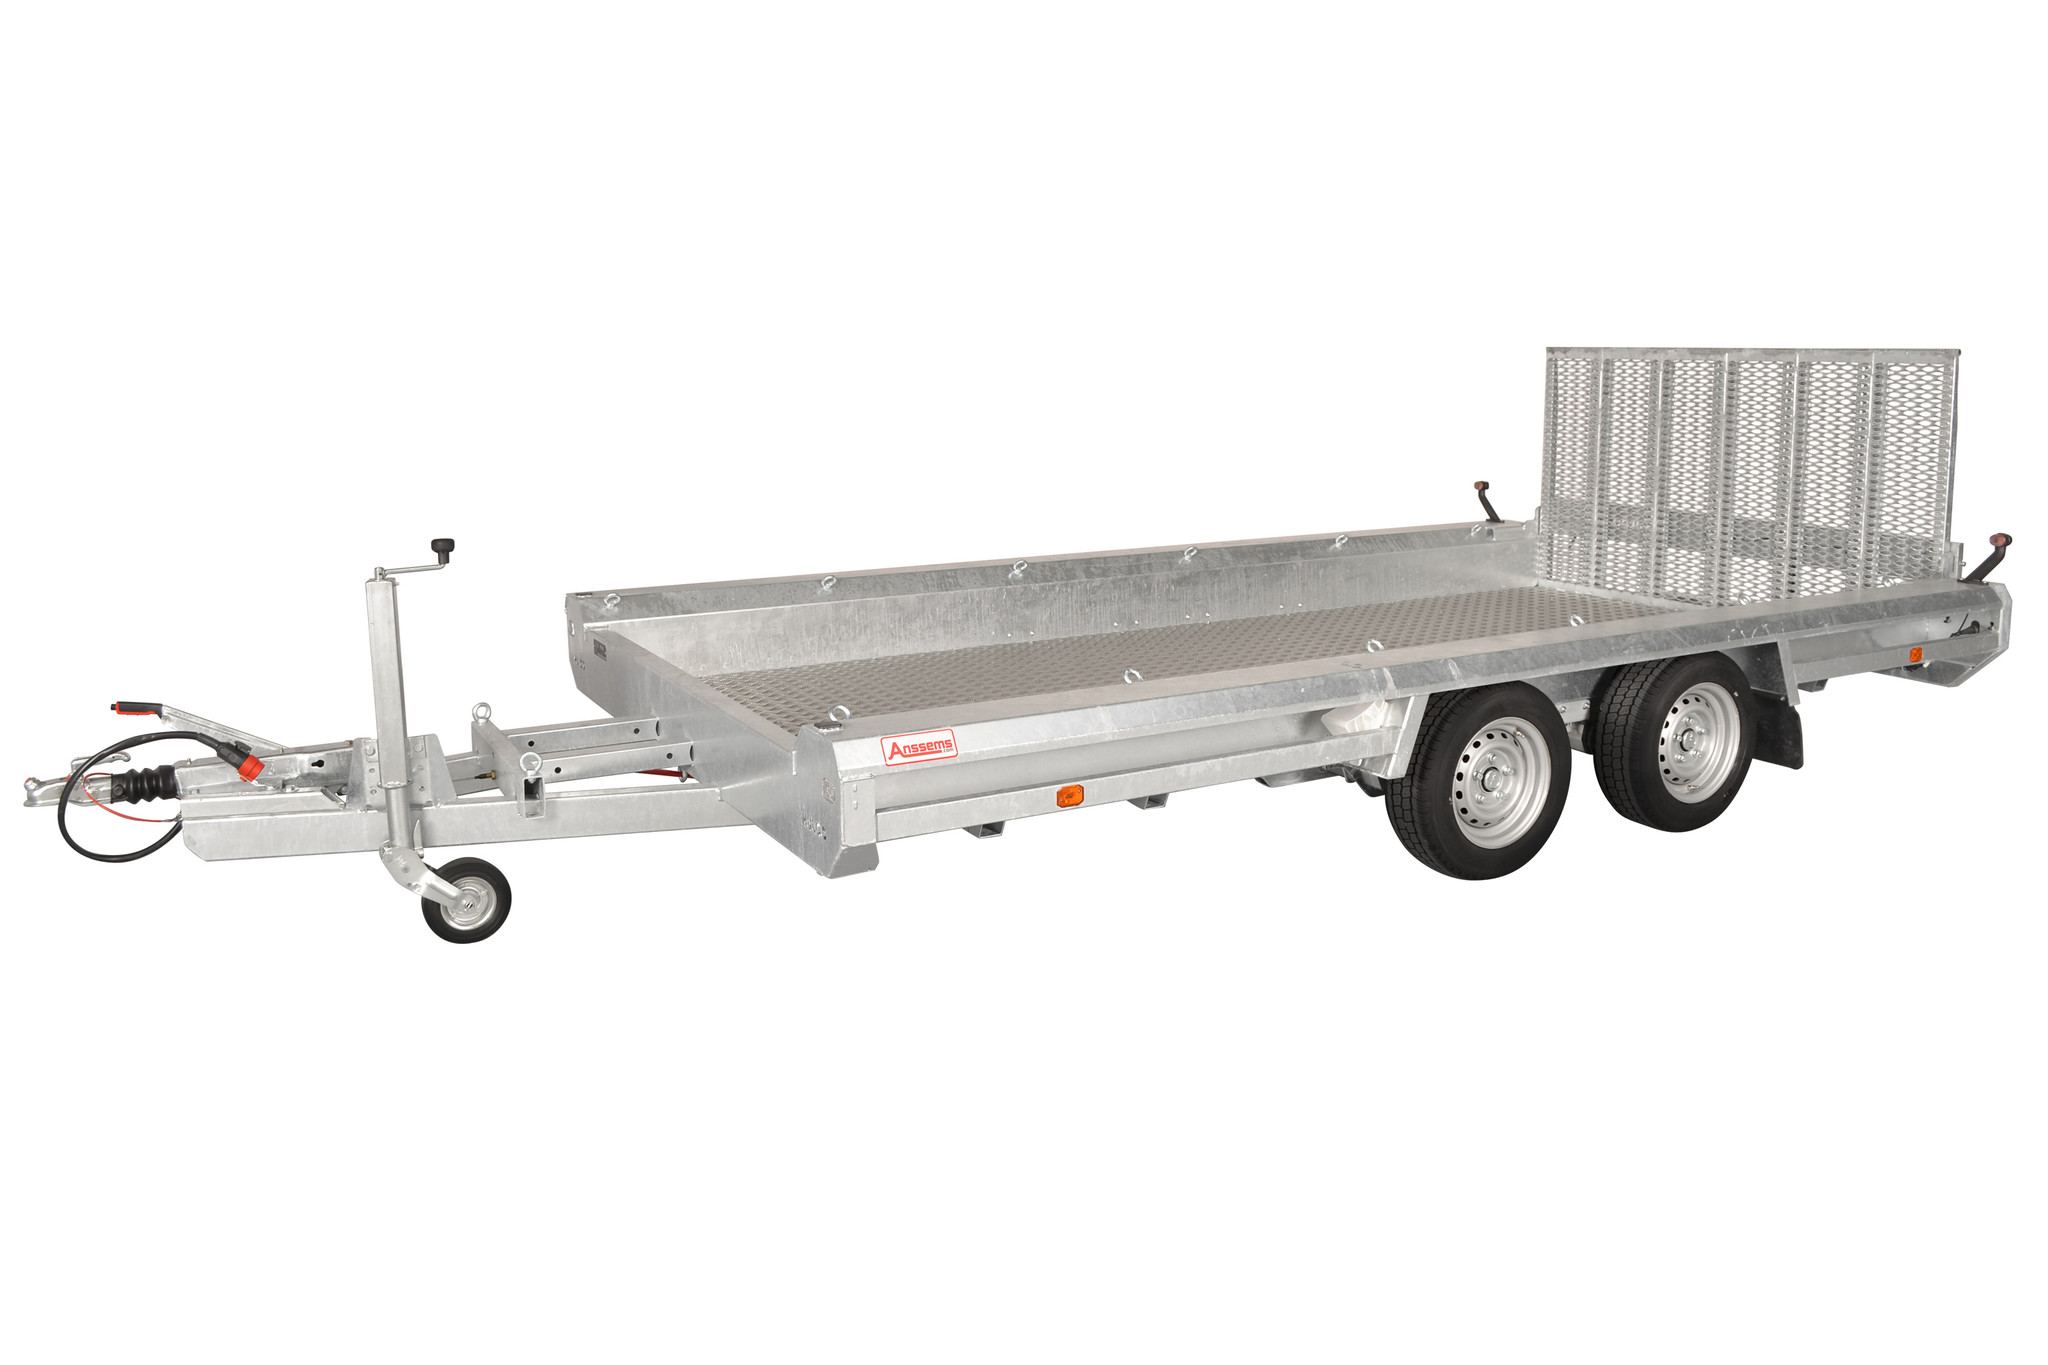 Hulco trailers Hulco TERRAX-2 3000 - 3000 kg bruto laadvermogen - machinetransporter - 394x180 cm laadoppervlak - geremd